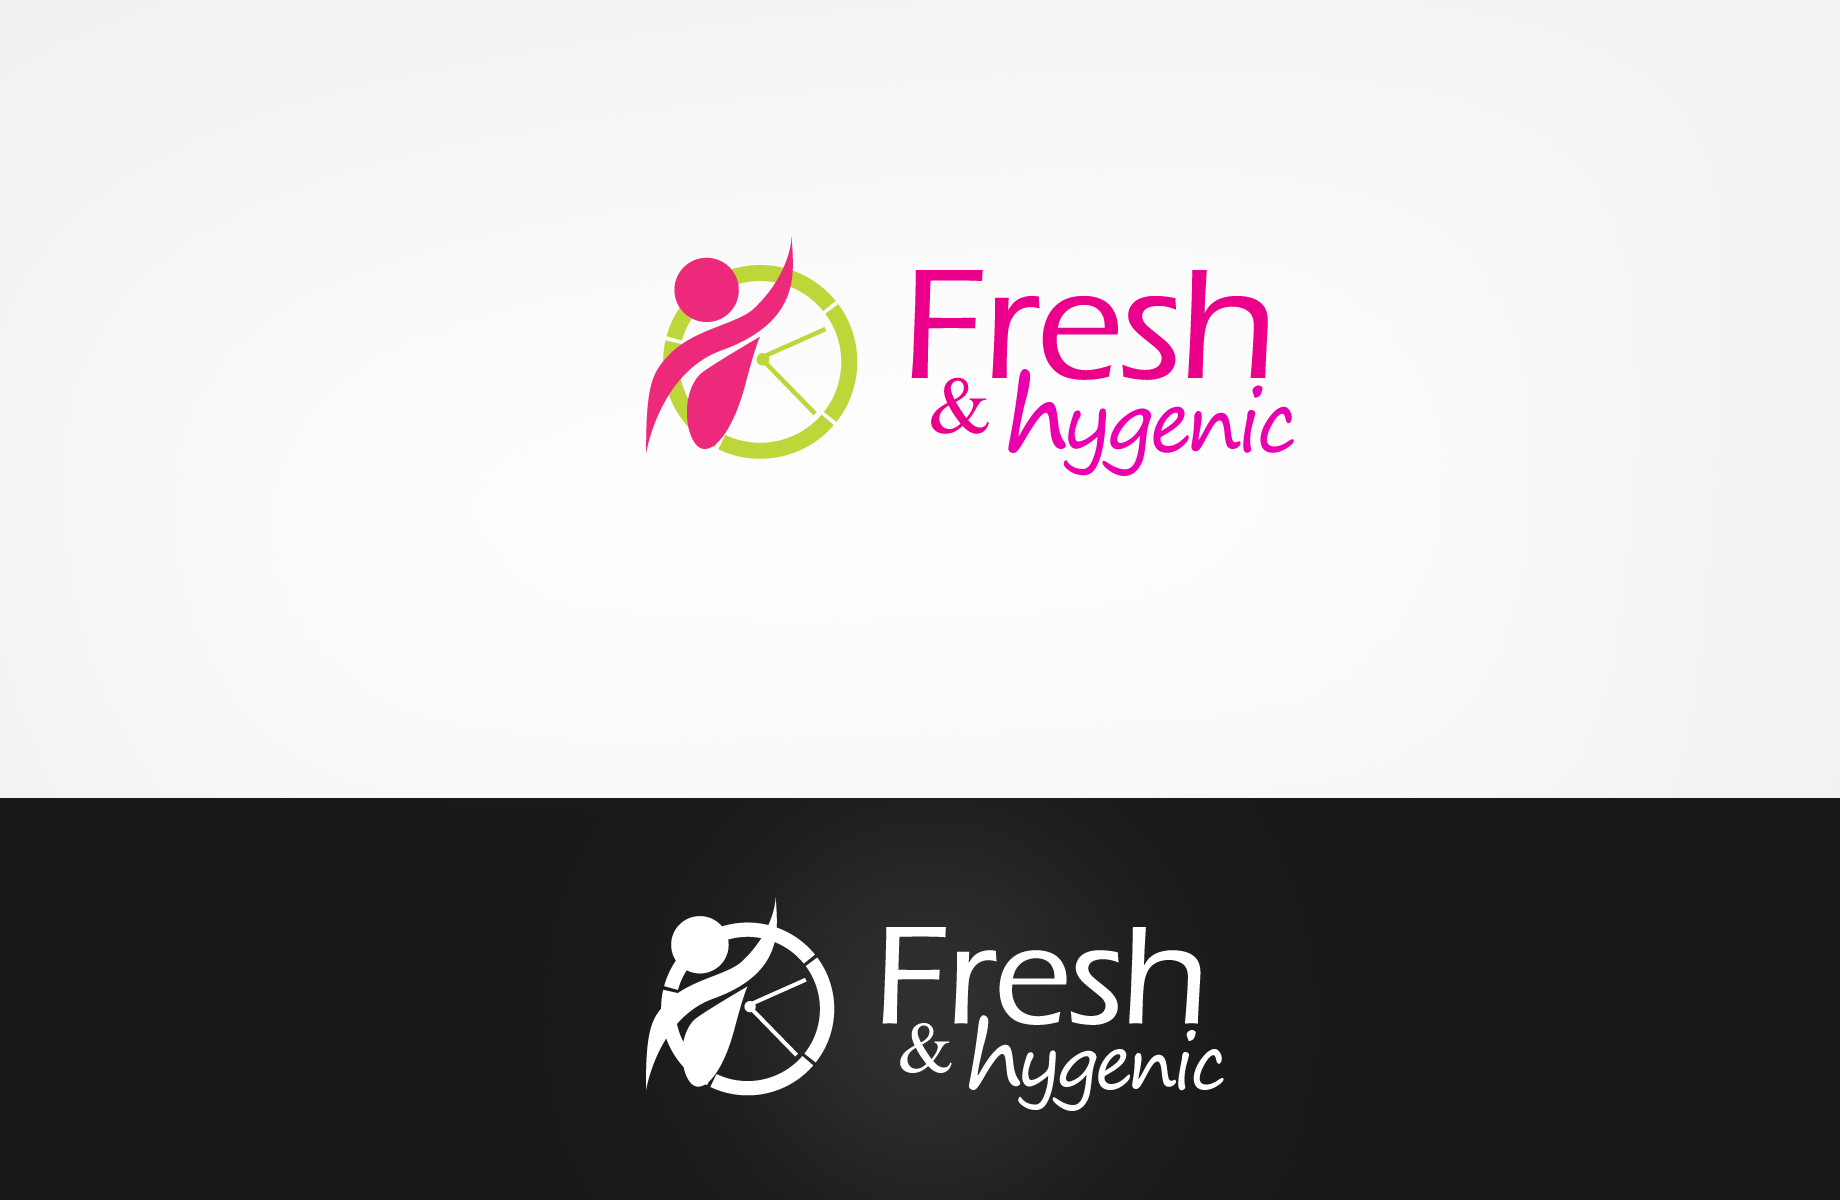 Logo Design by Jan Chua - Entry No. 29 in the Logo Design Contest Fun Logo Design for Fresh & Hygenic.